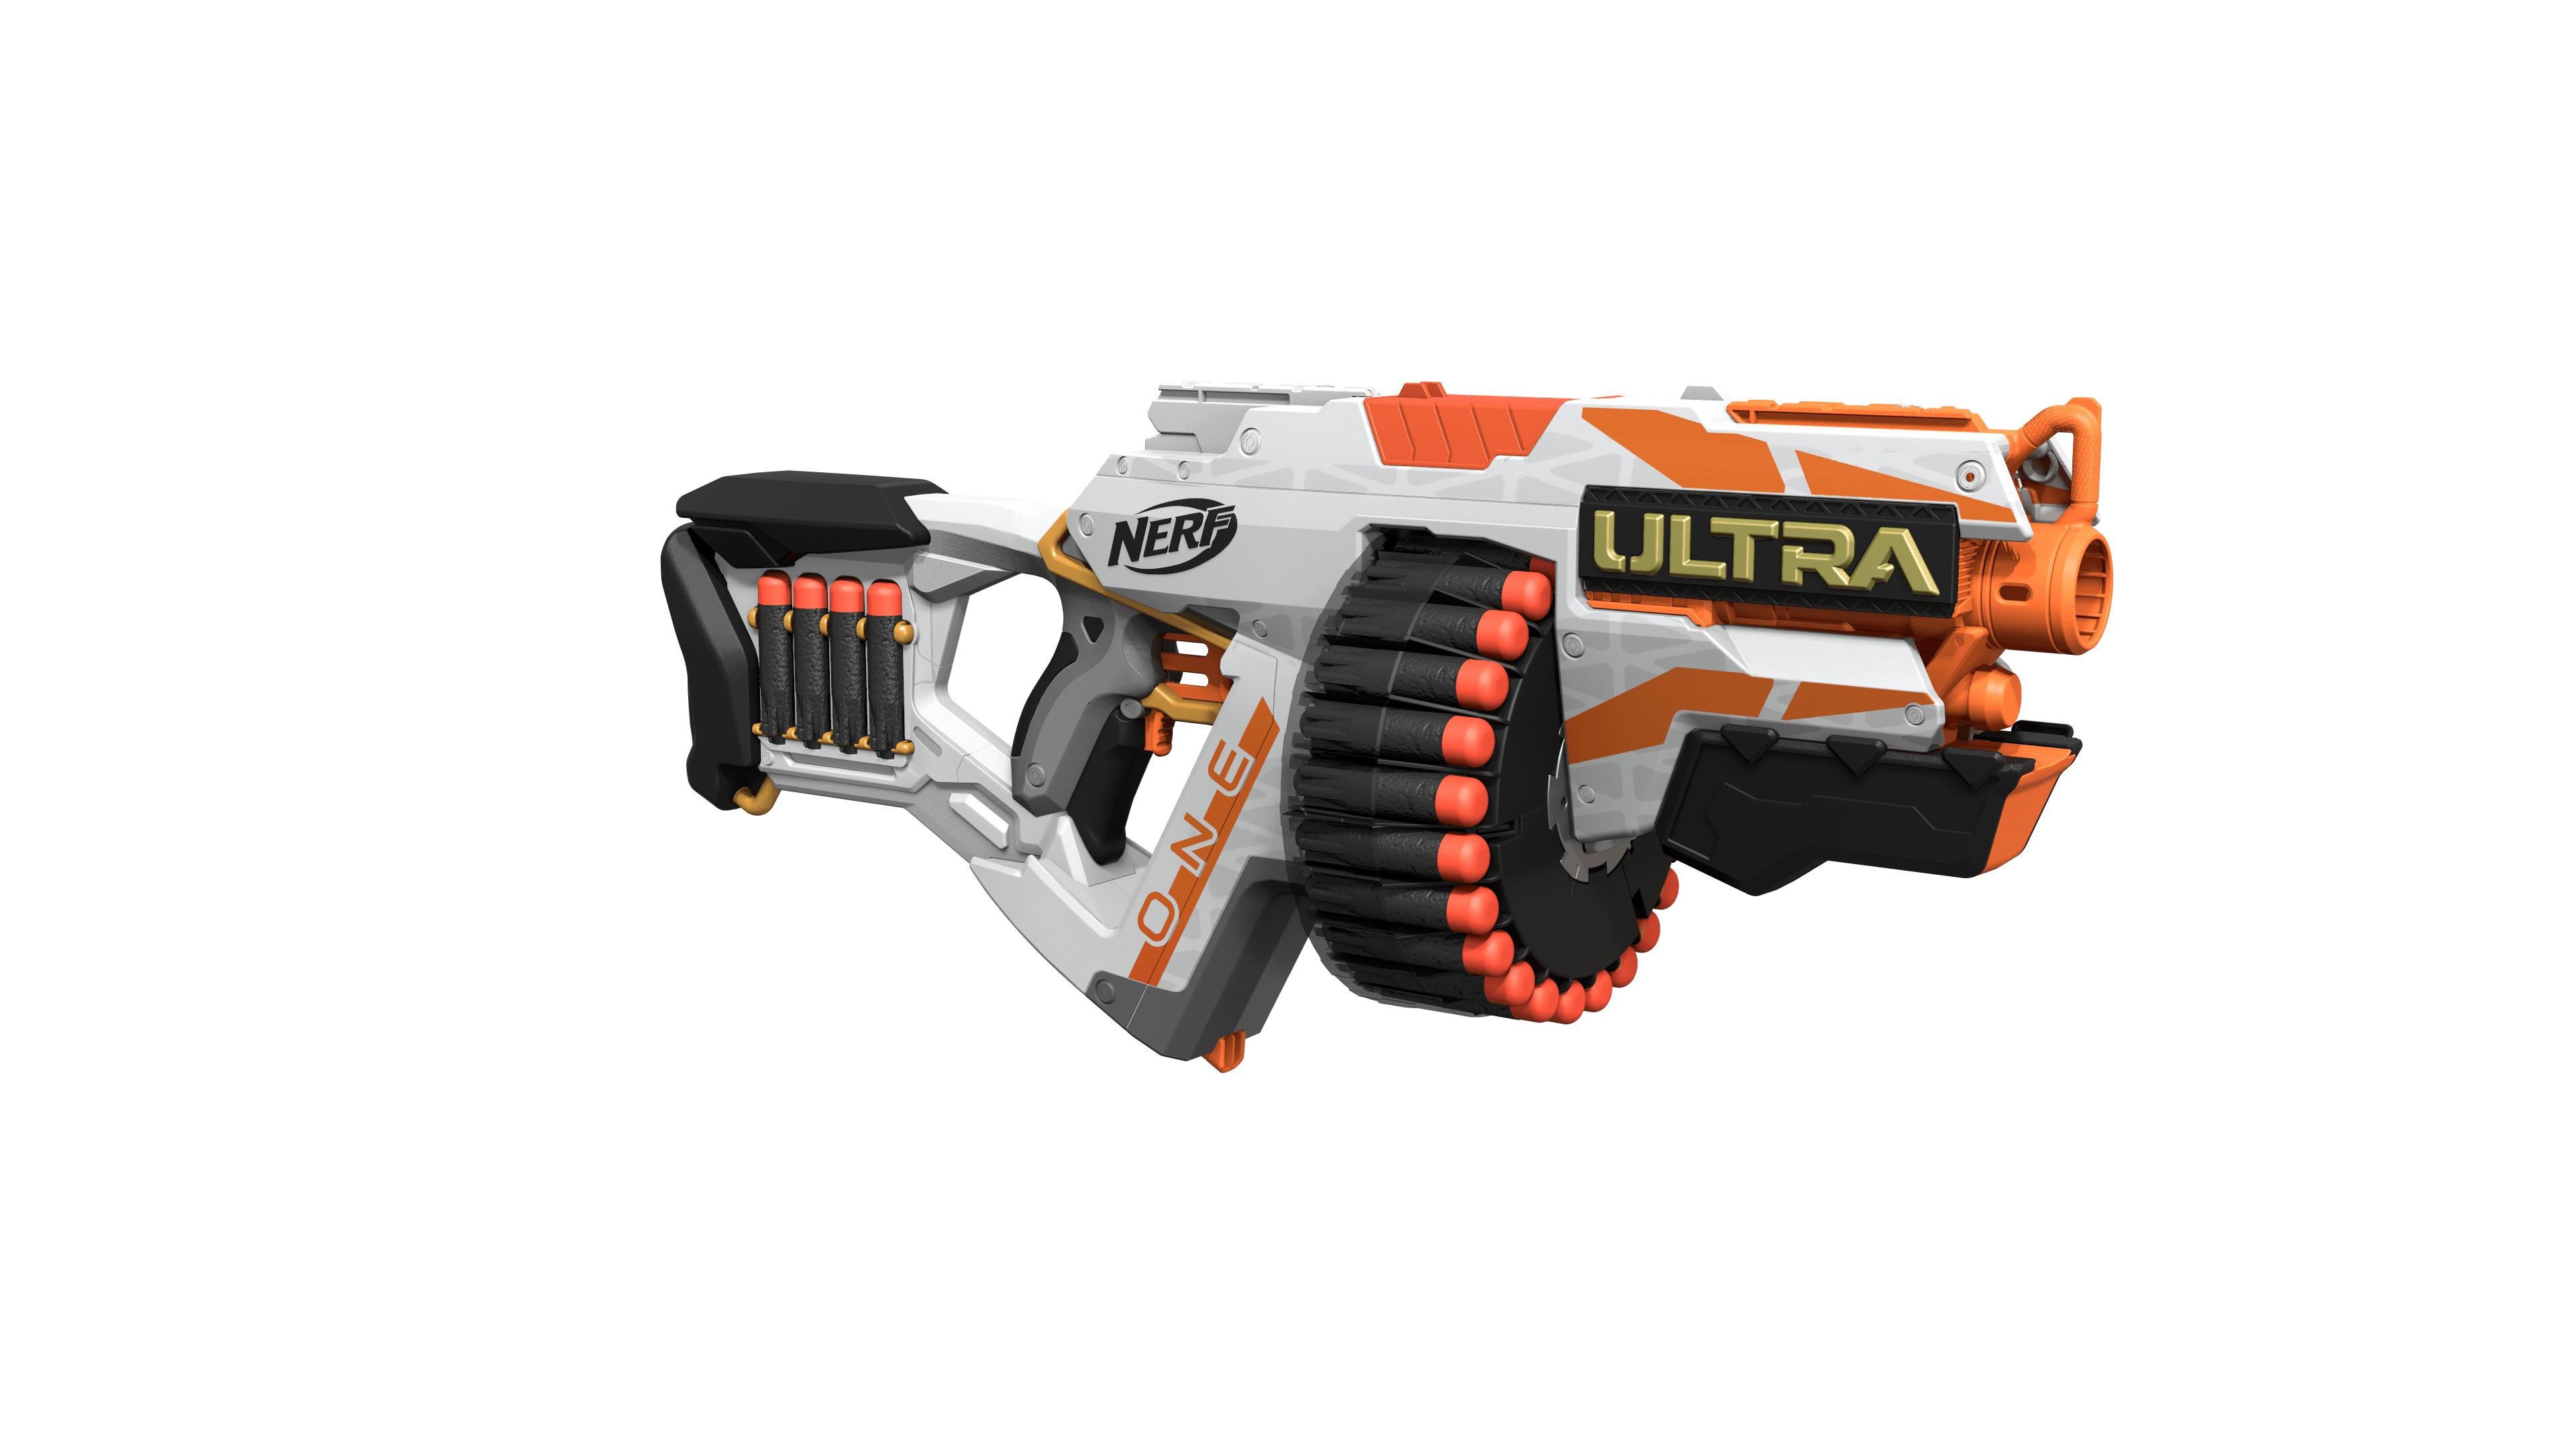 ultra blaster img 110